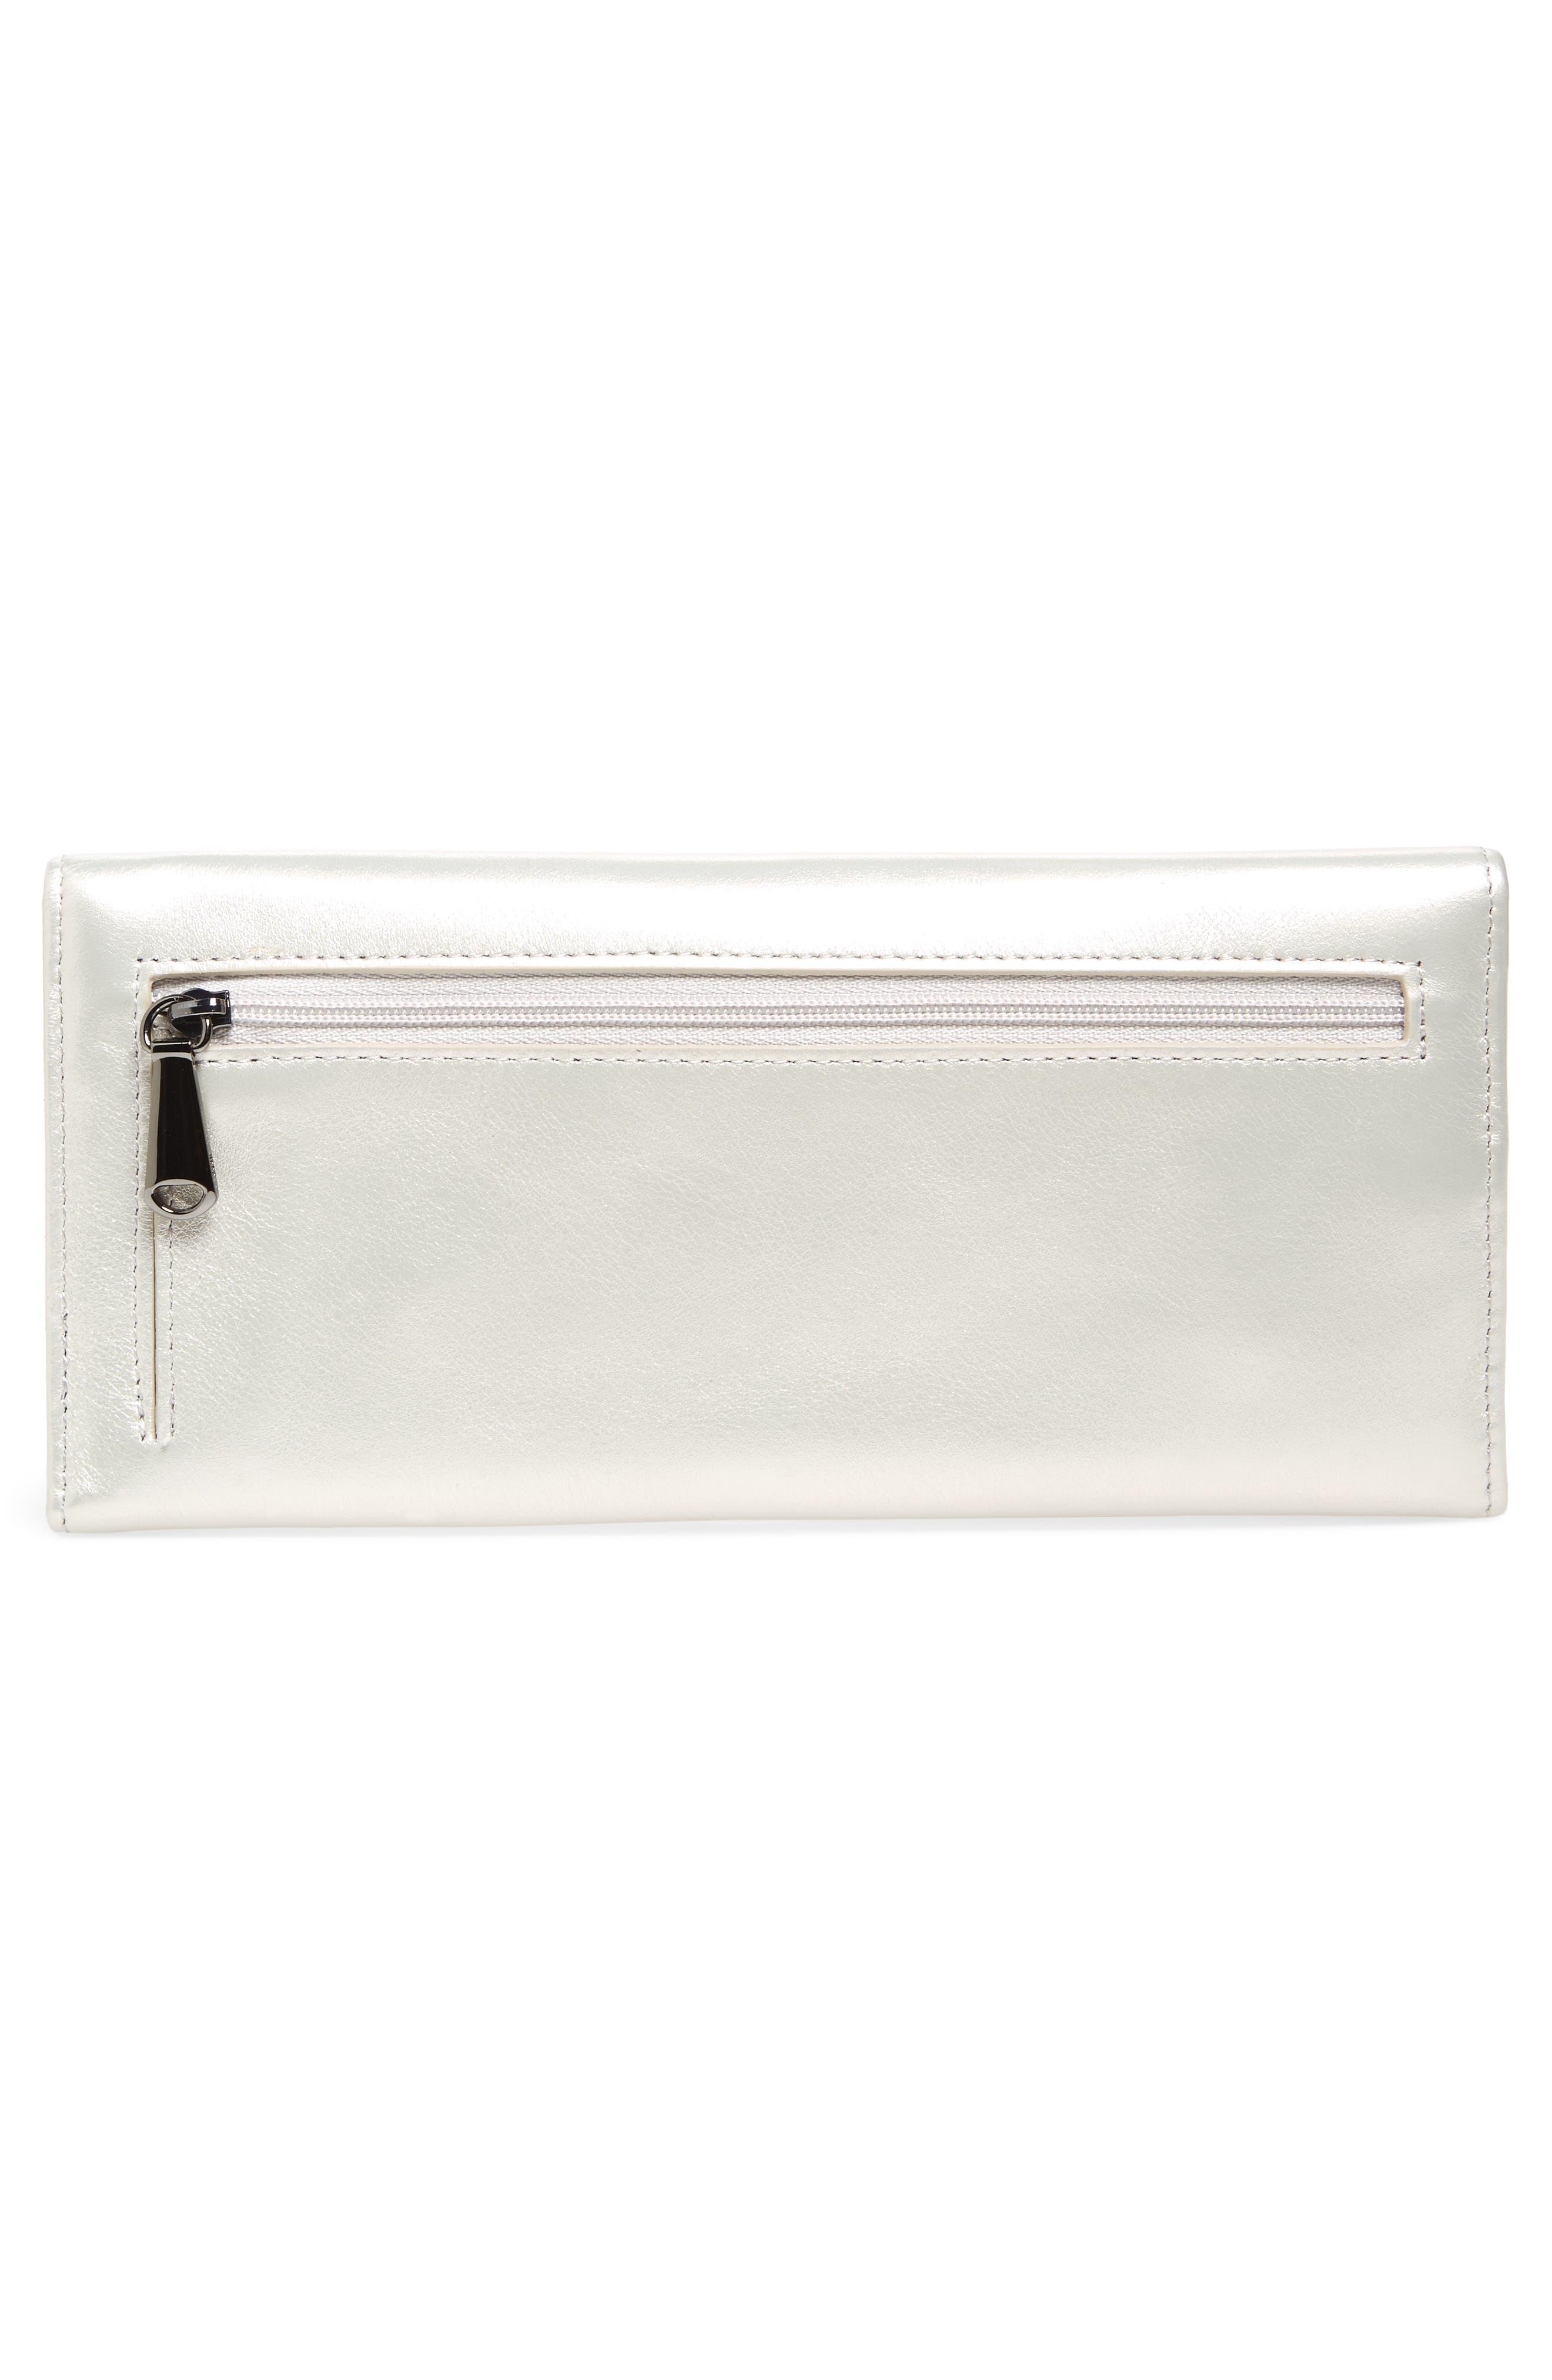 'Sadie' Leather Wallet,                             Alternate thumbnail 104, color,